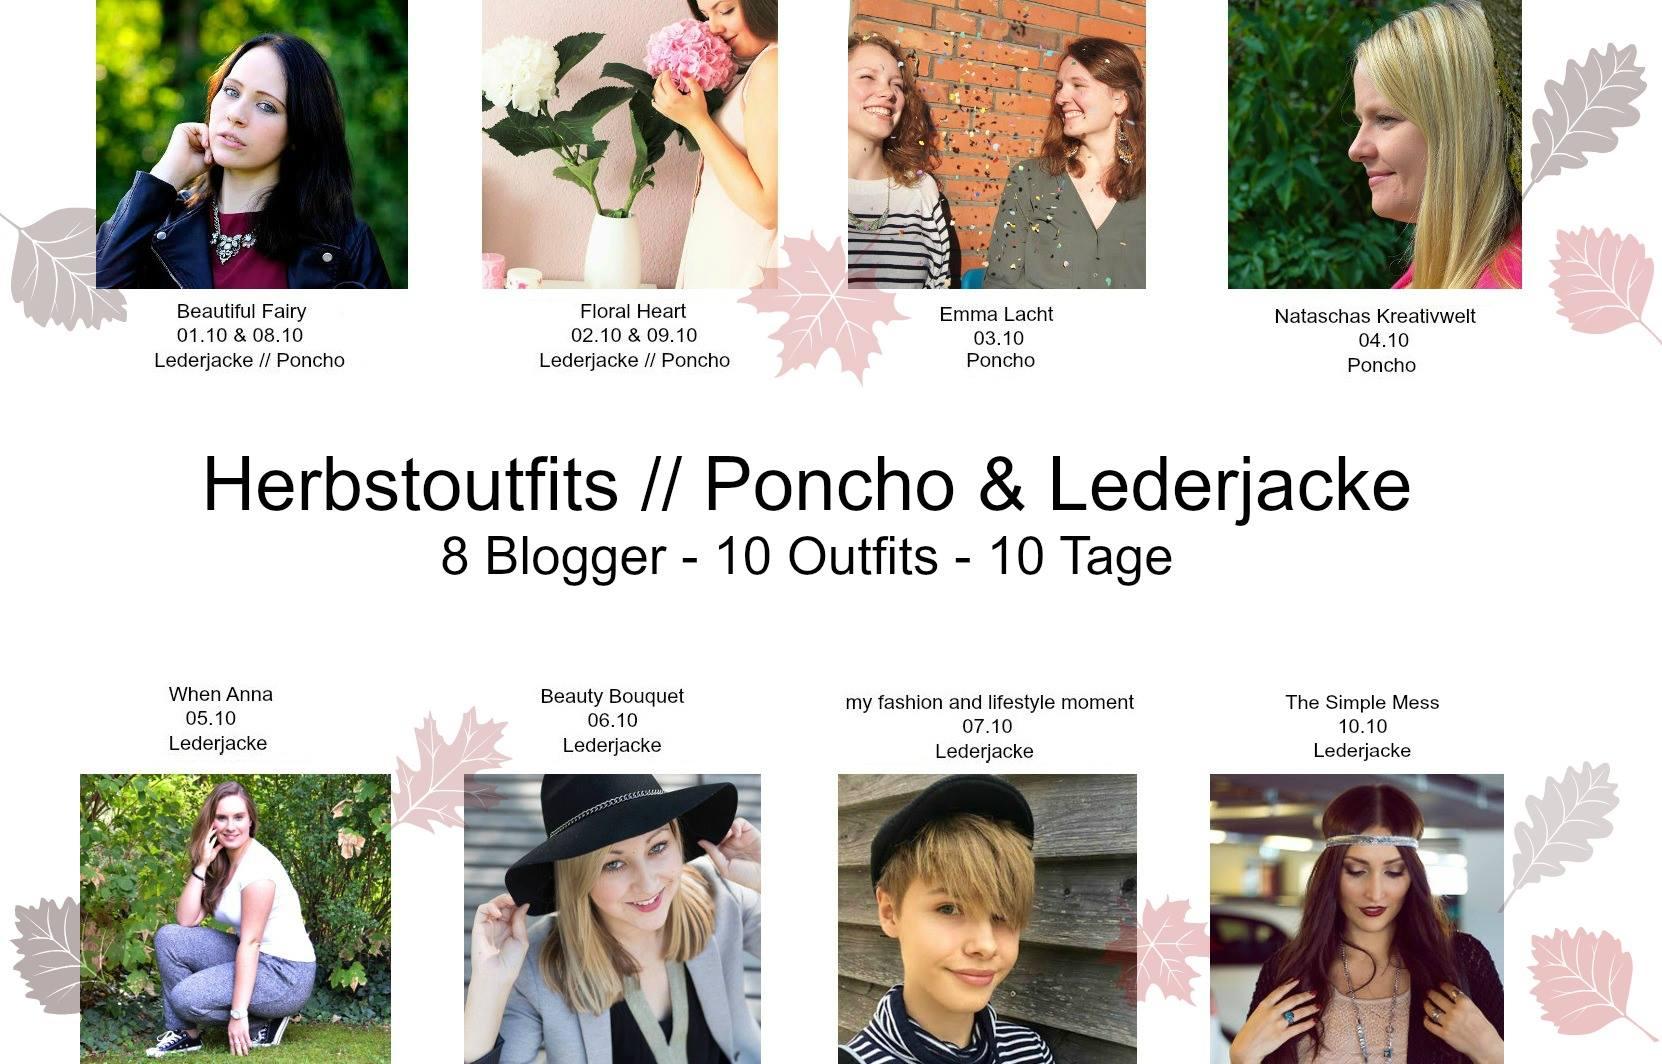 blogparade_herbstoutfit